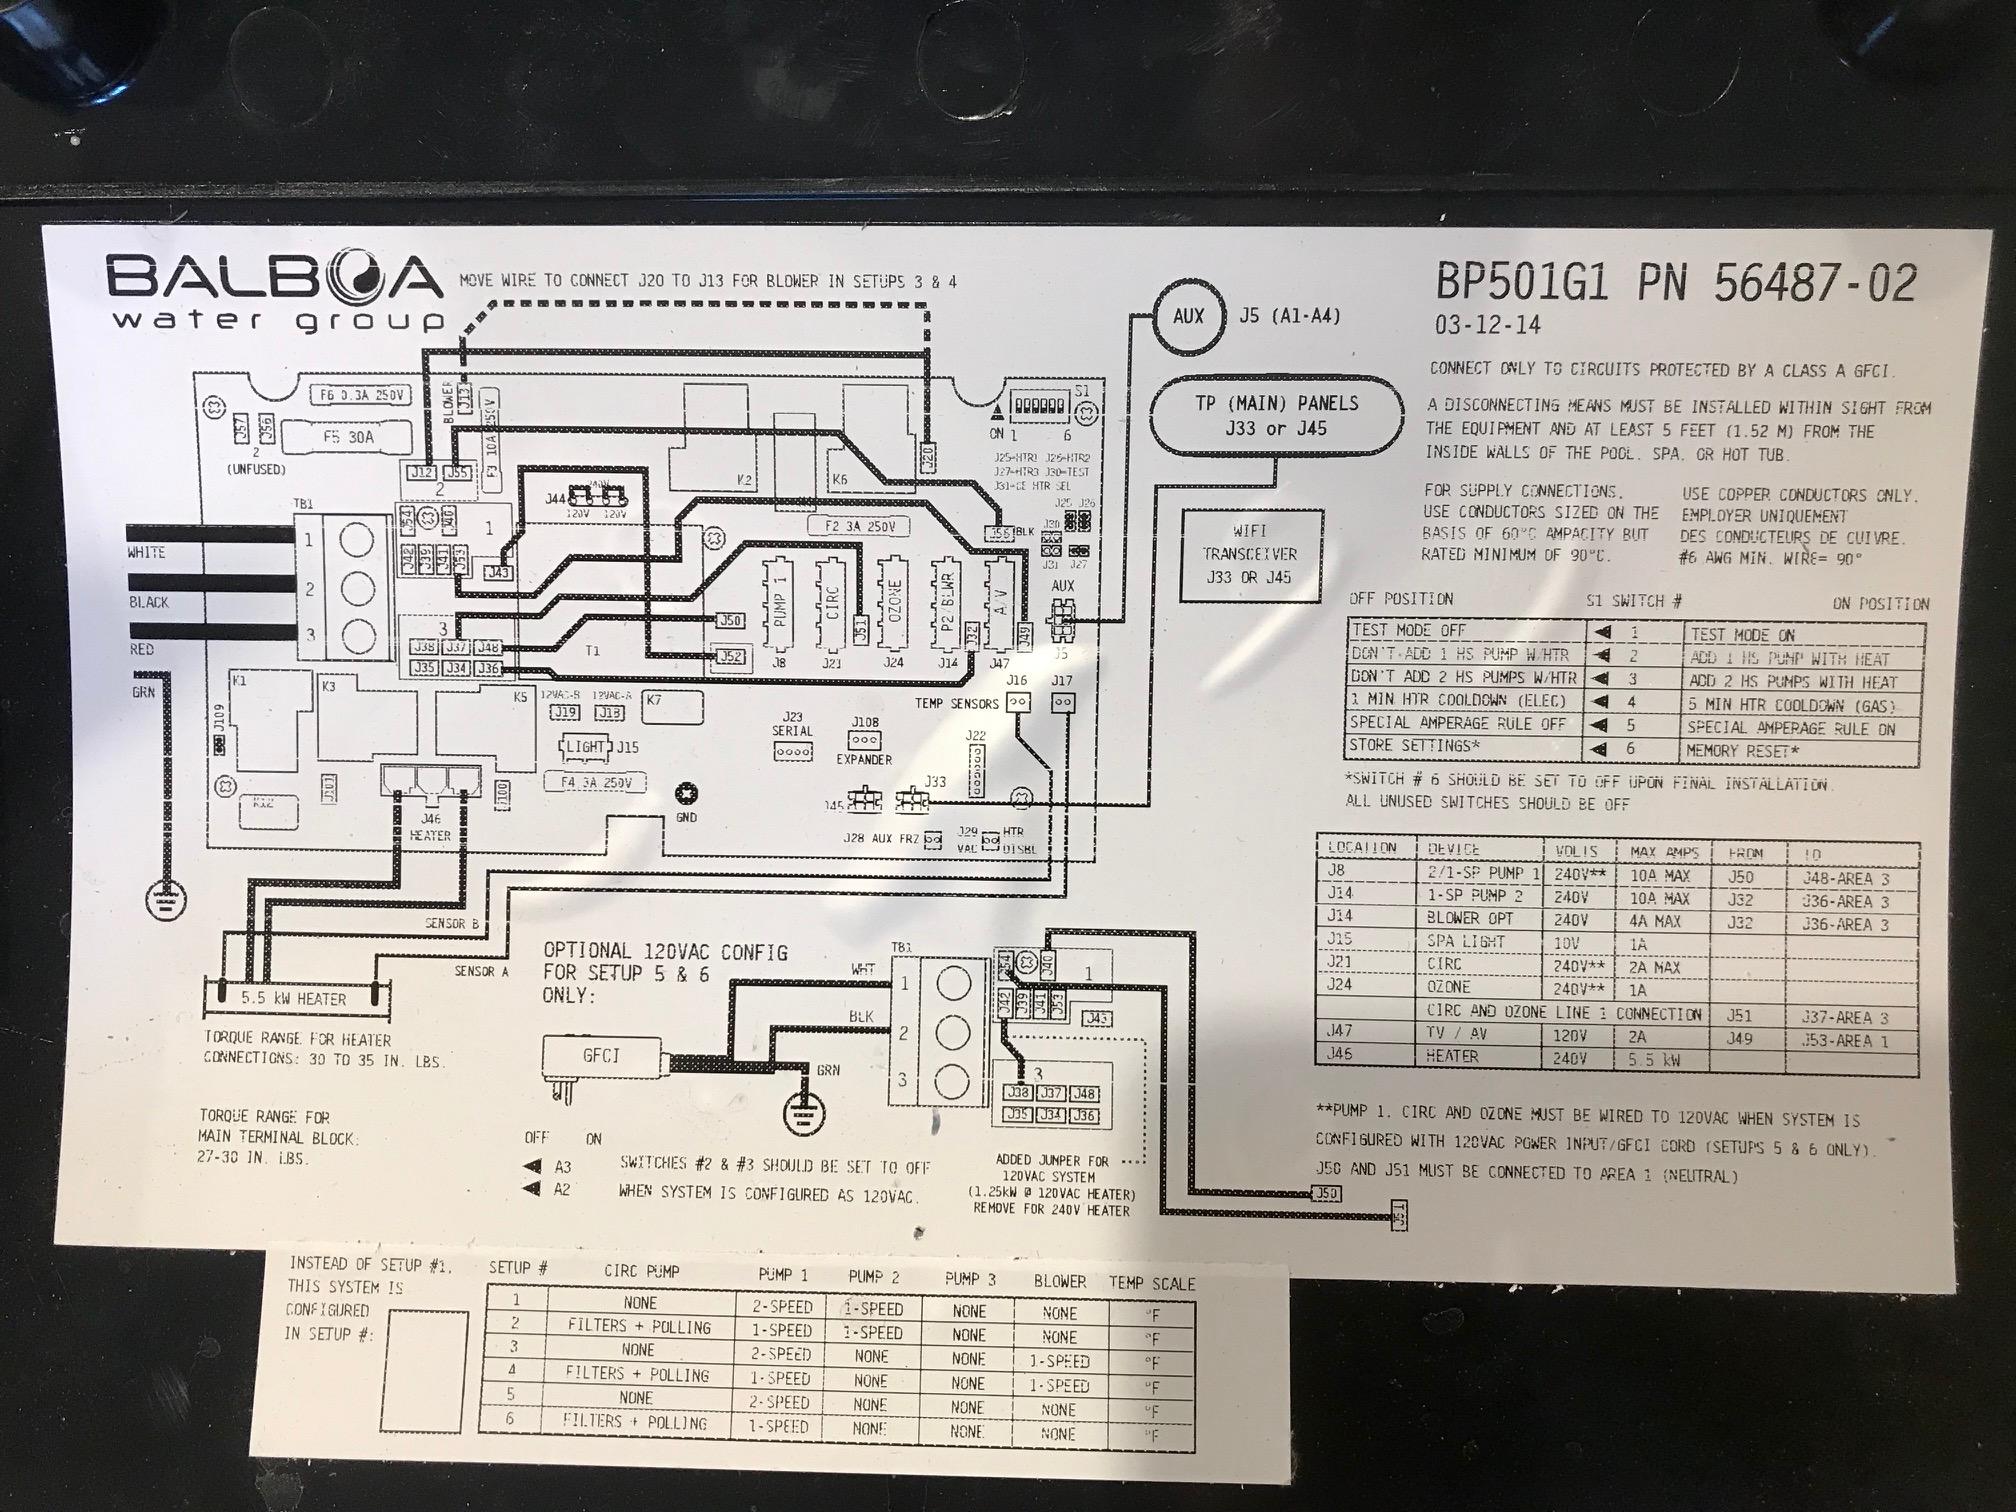 Balboa Hs Vs Wiring Diagram on